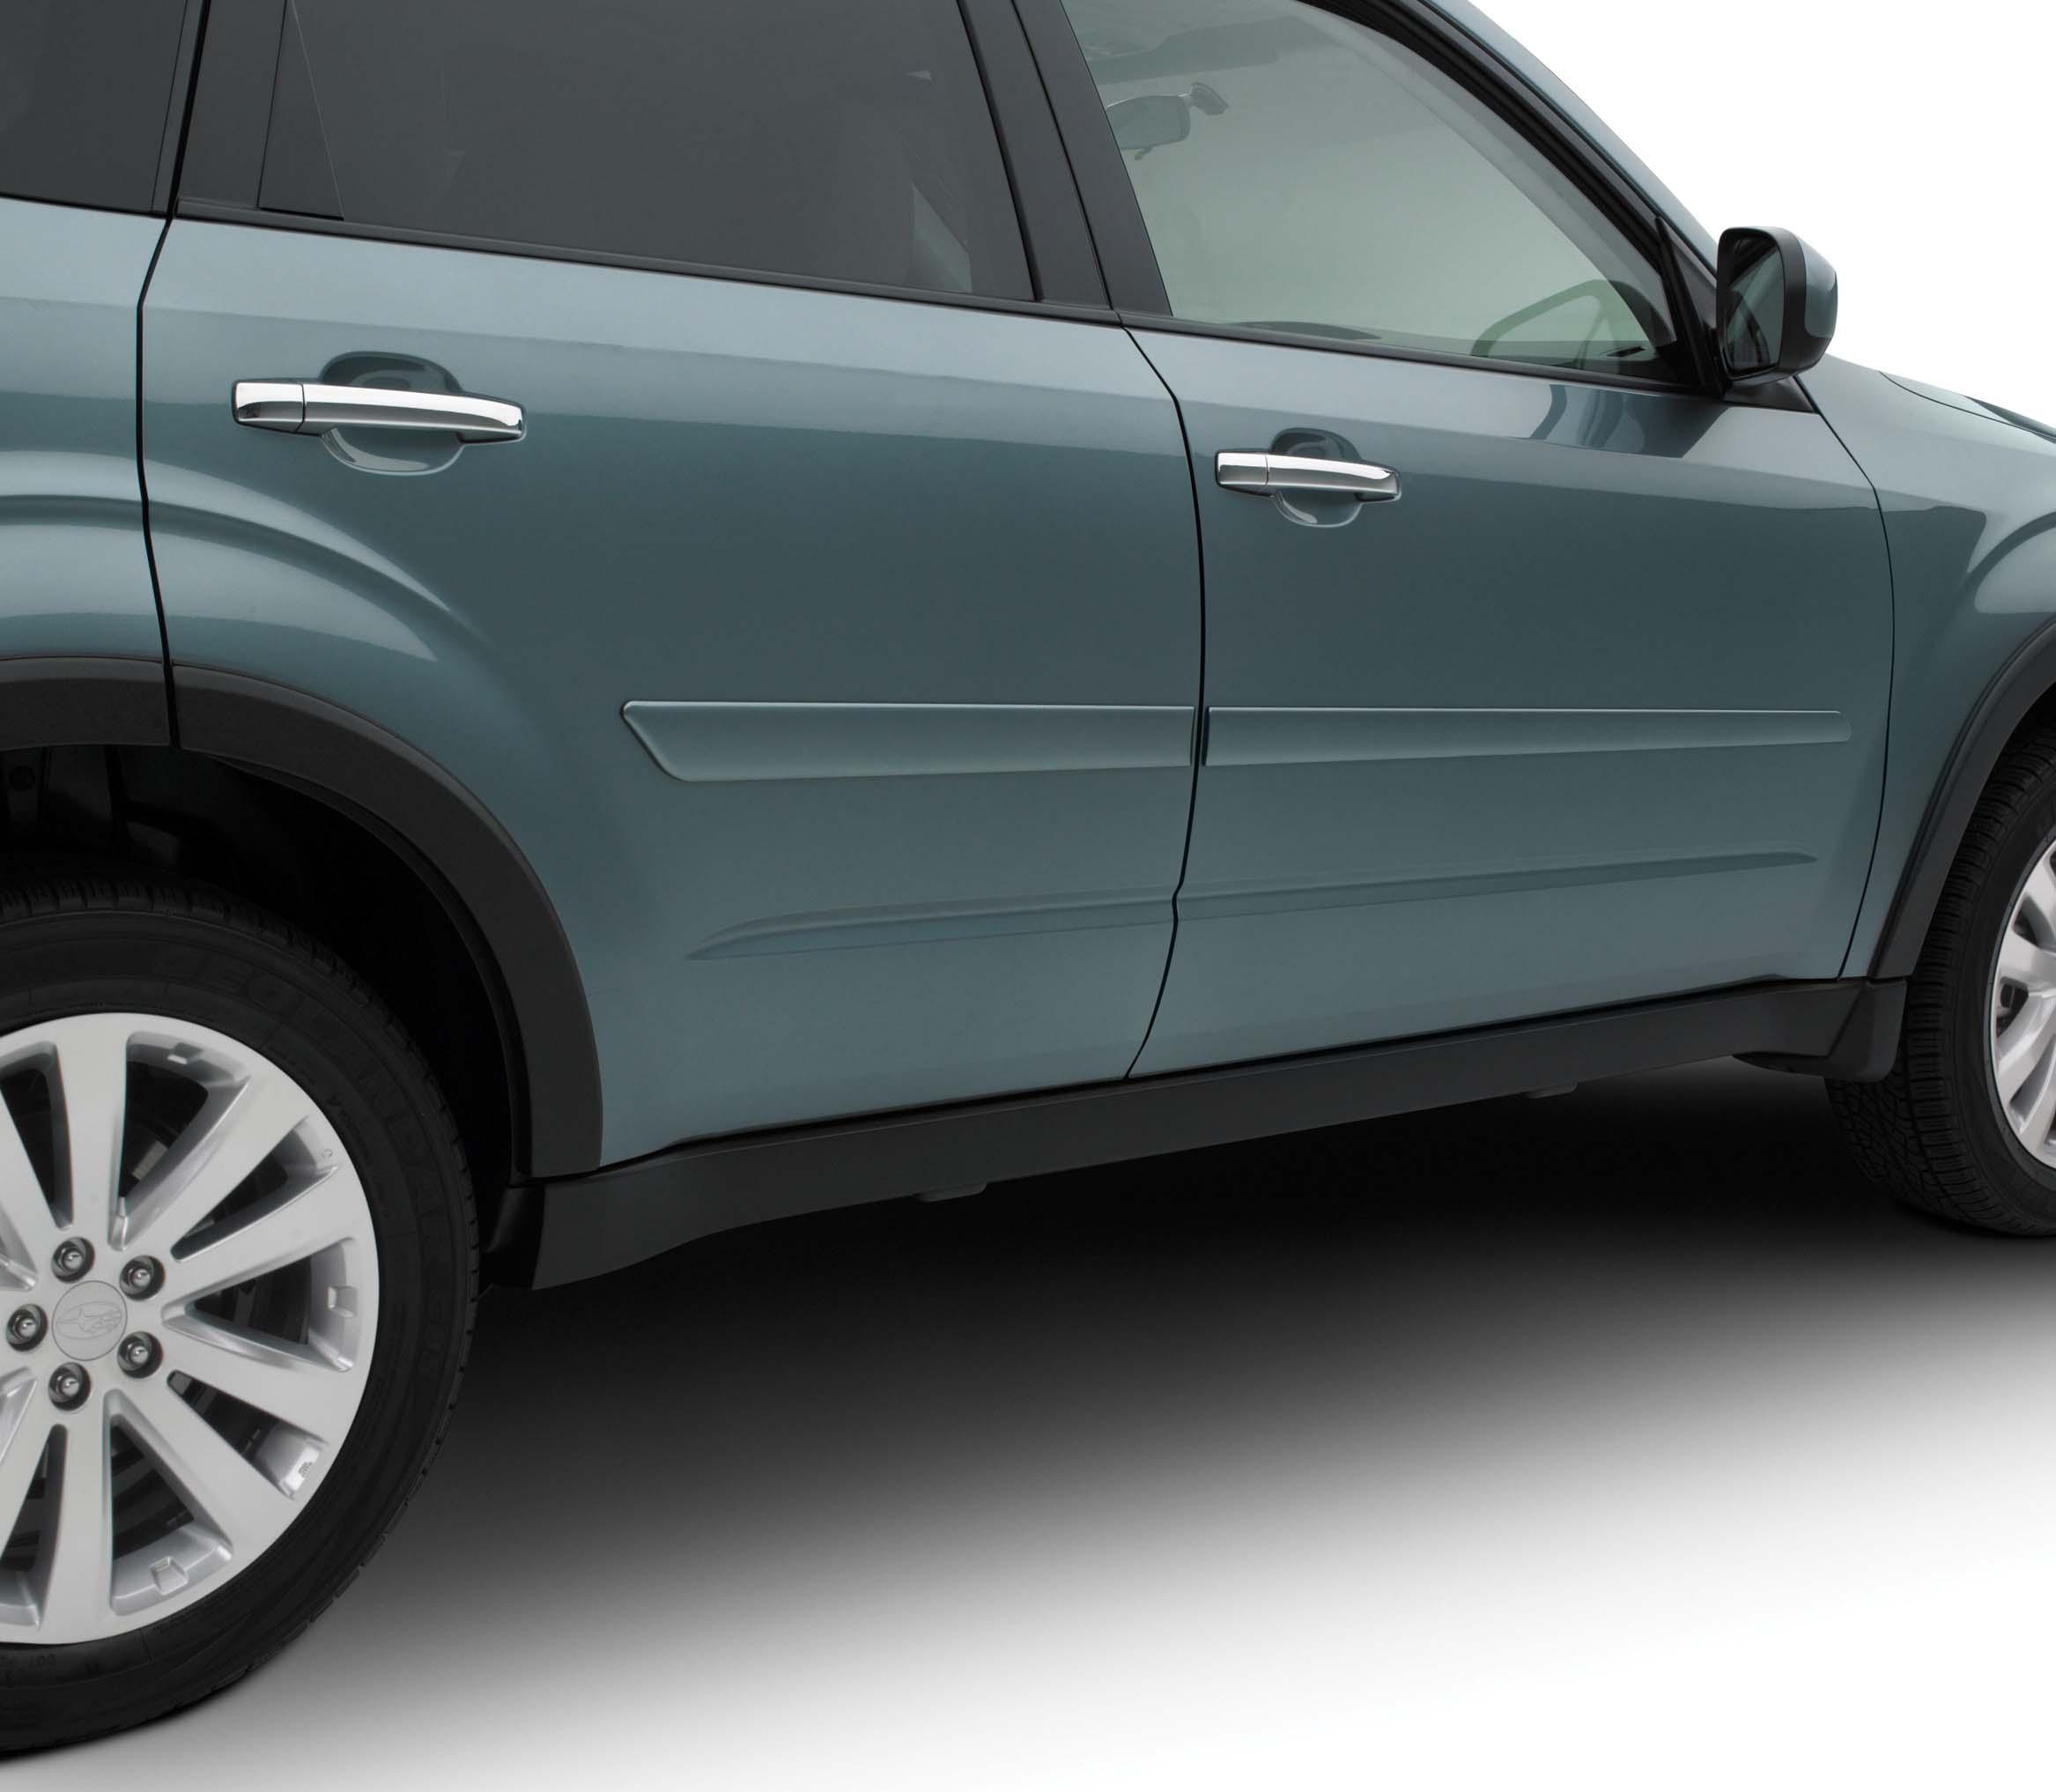 2011 Subaru Forester Body Side Molding Kit Metallic